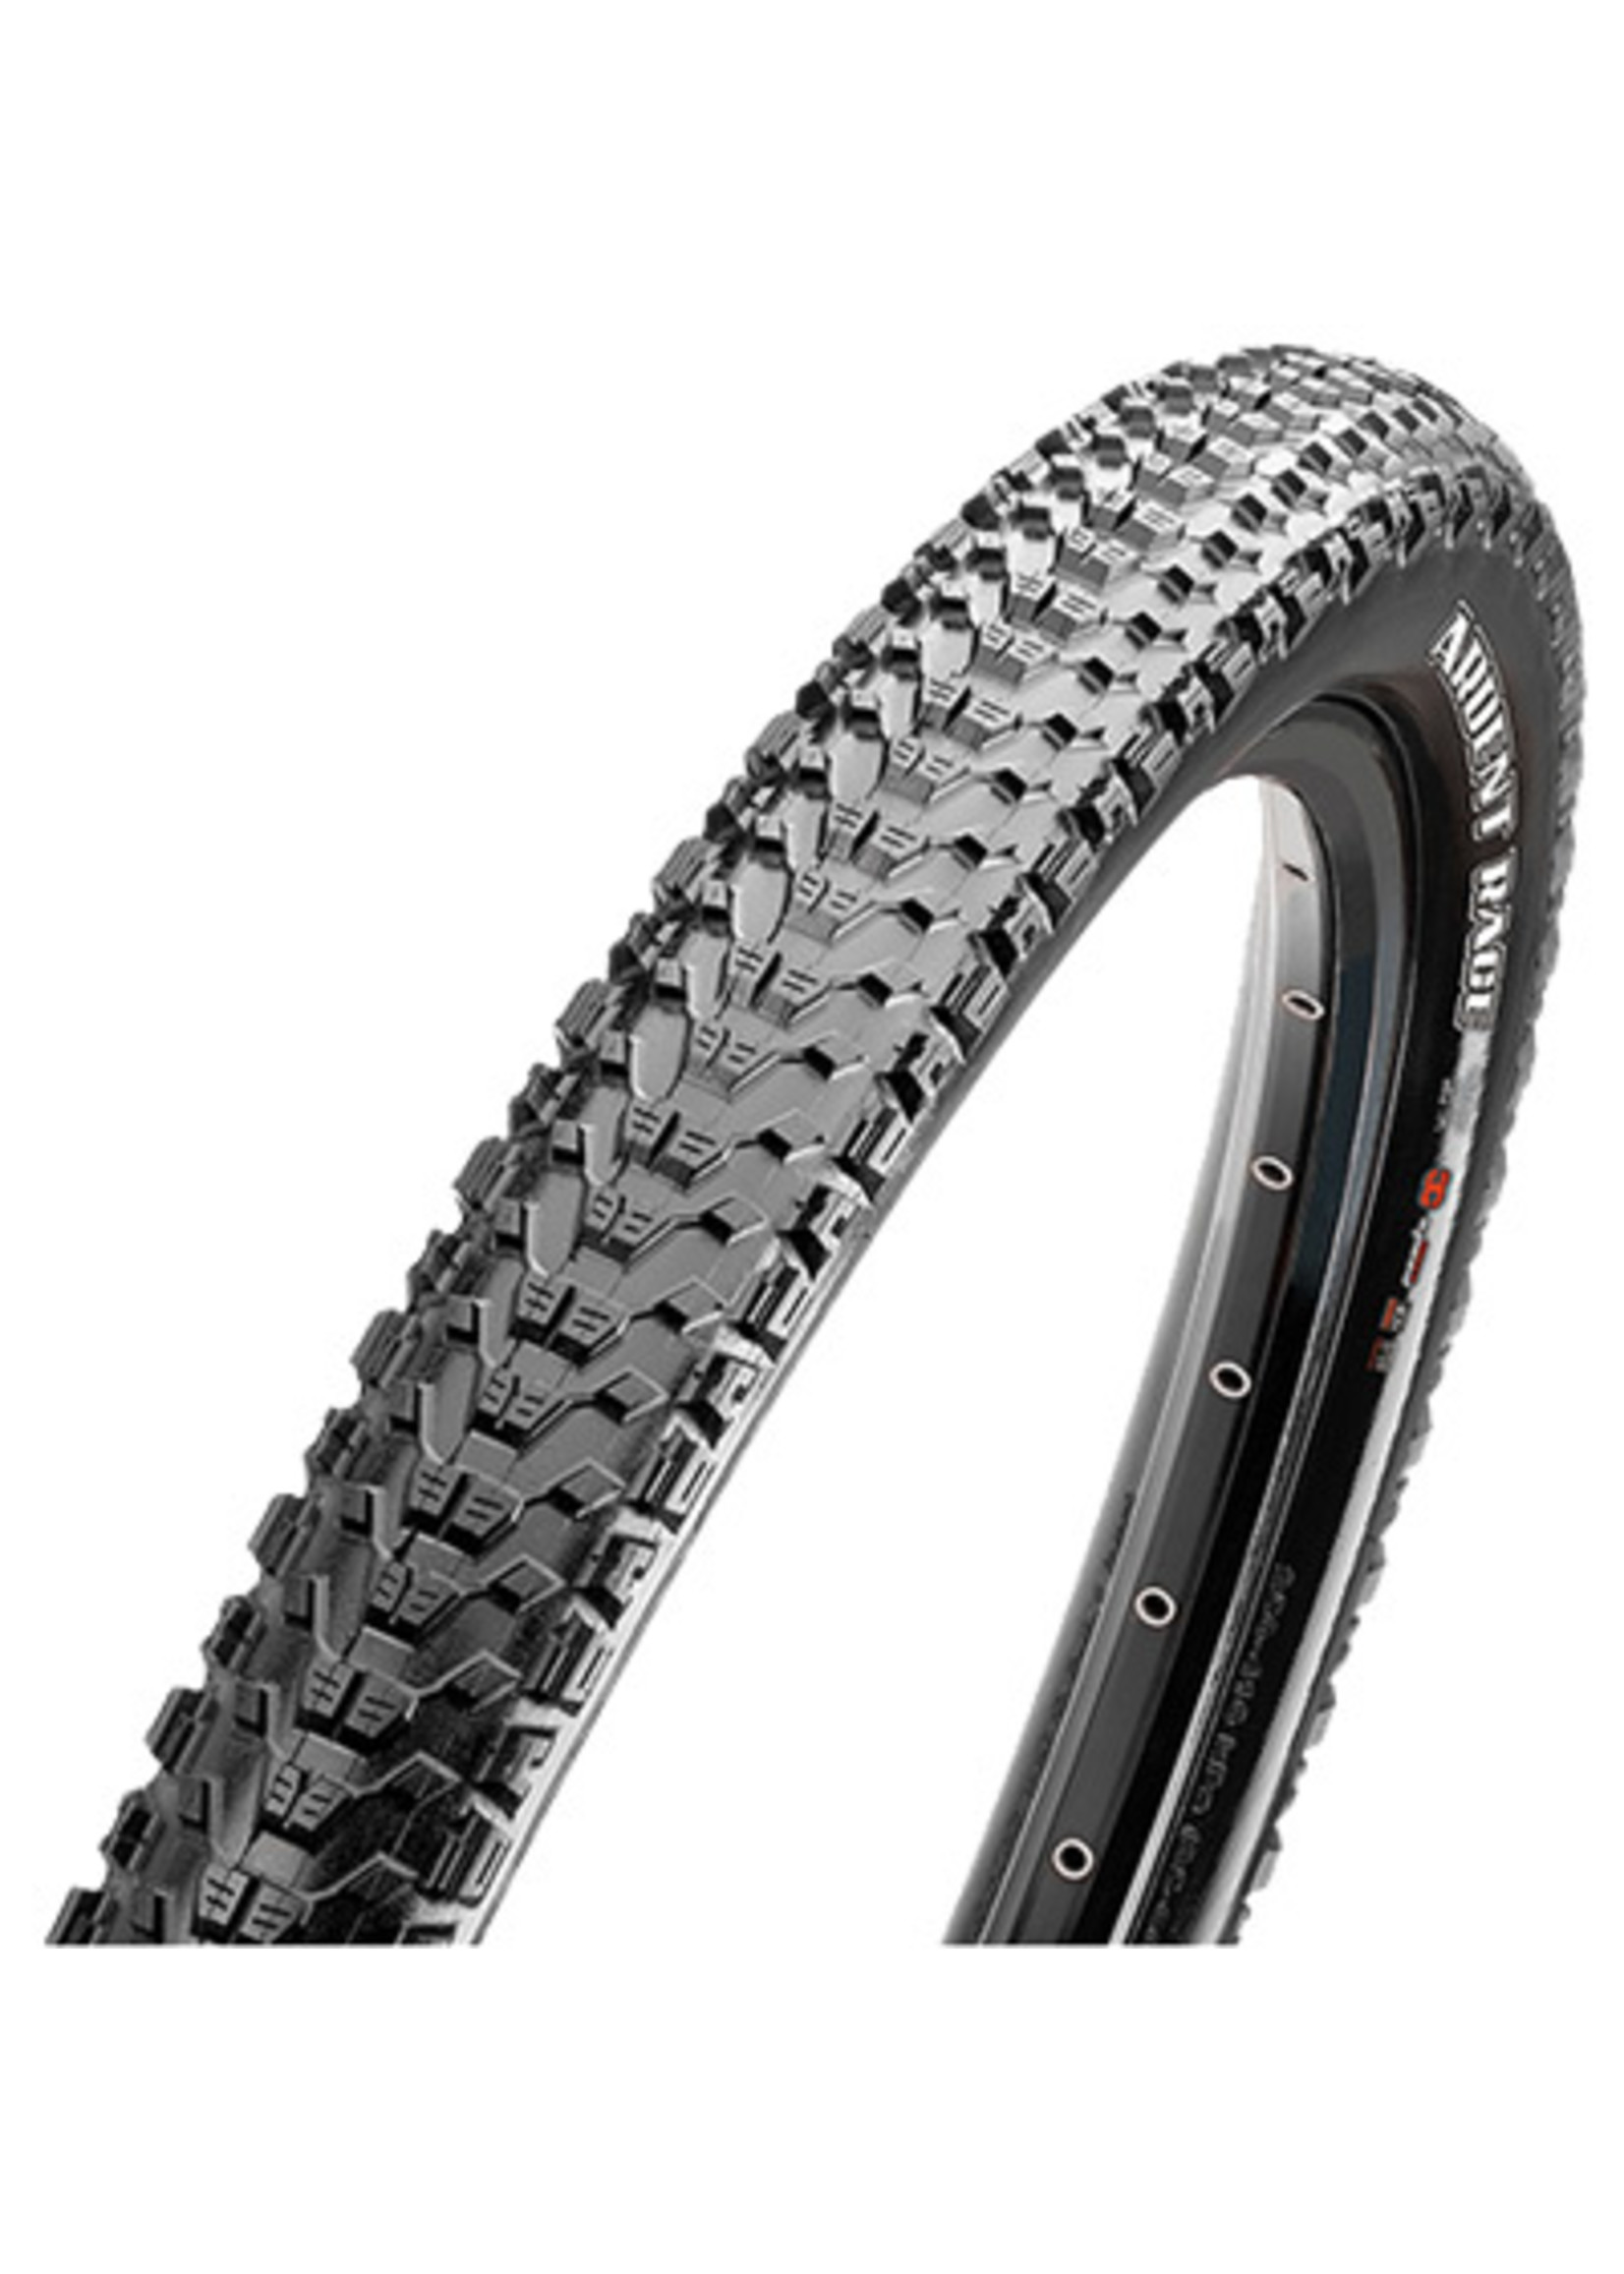 MAXXIS Maxxis Ardent Race Tire - 27.5 x 2.2, Tubeless, Folding, Black, 3C MaxxSpeed, EXO